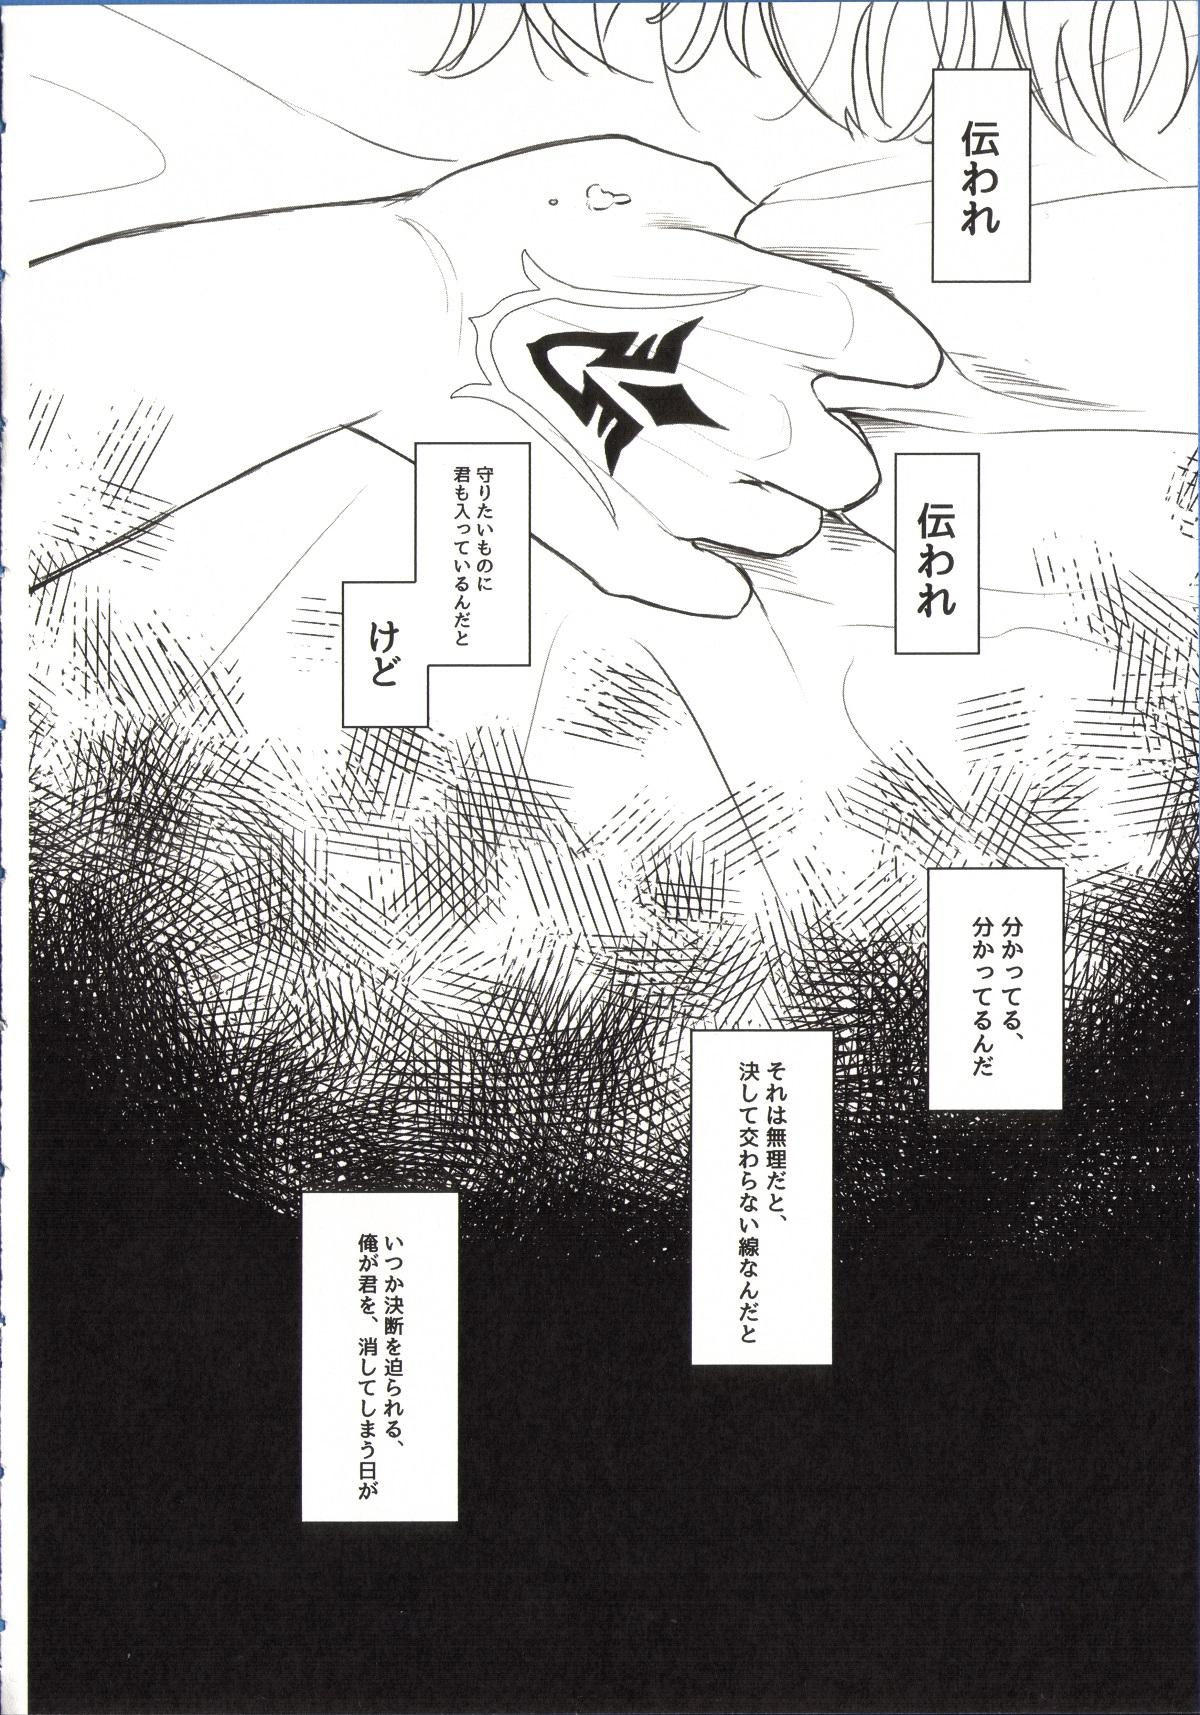 REASON/ANSWER 31